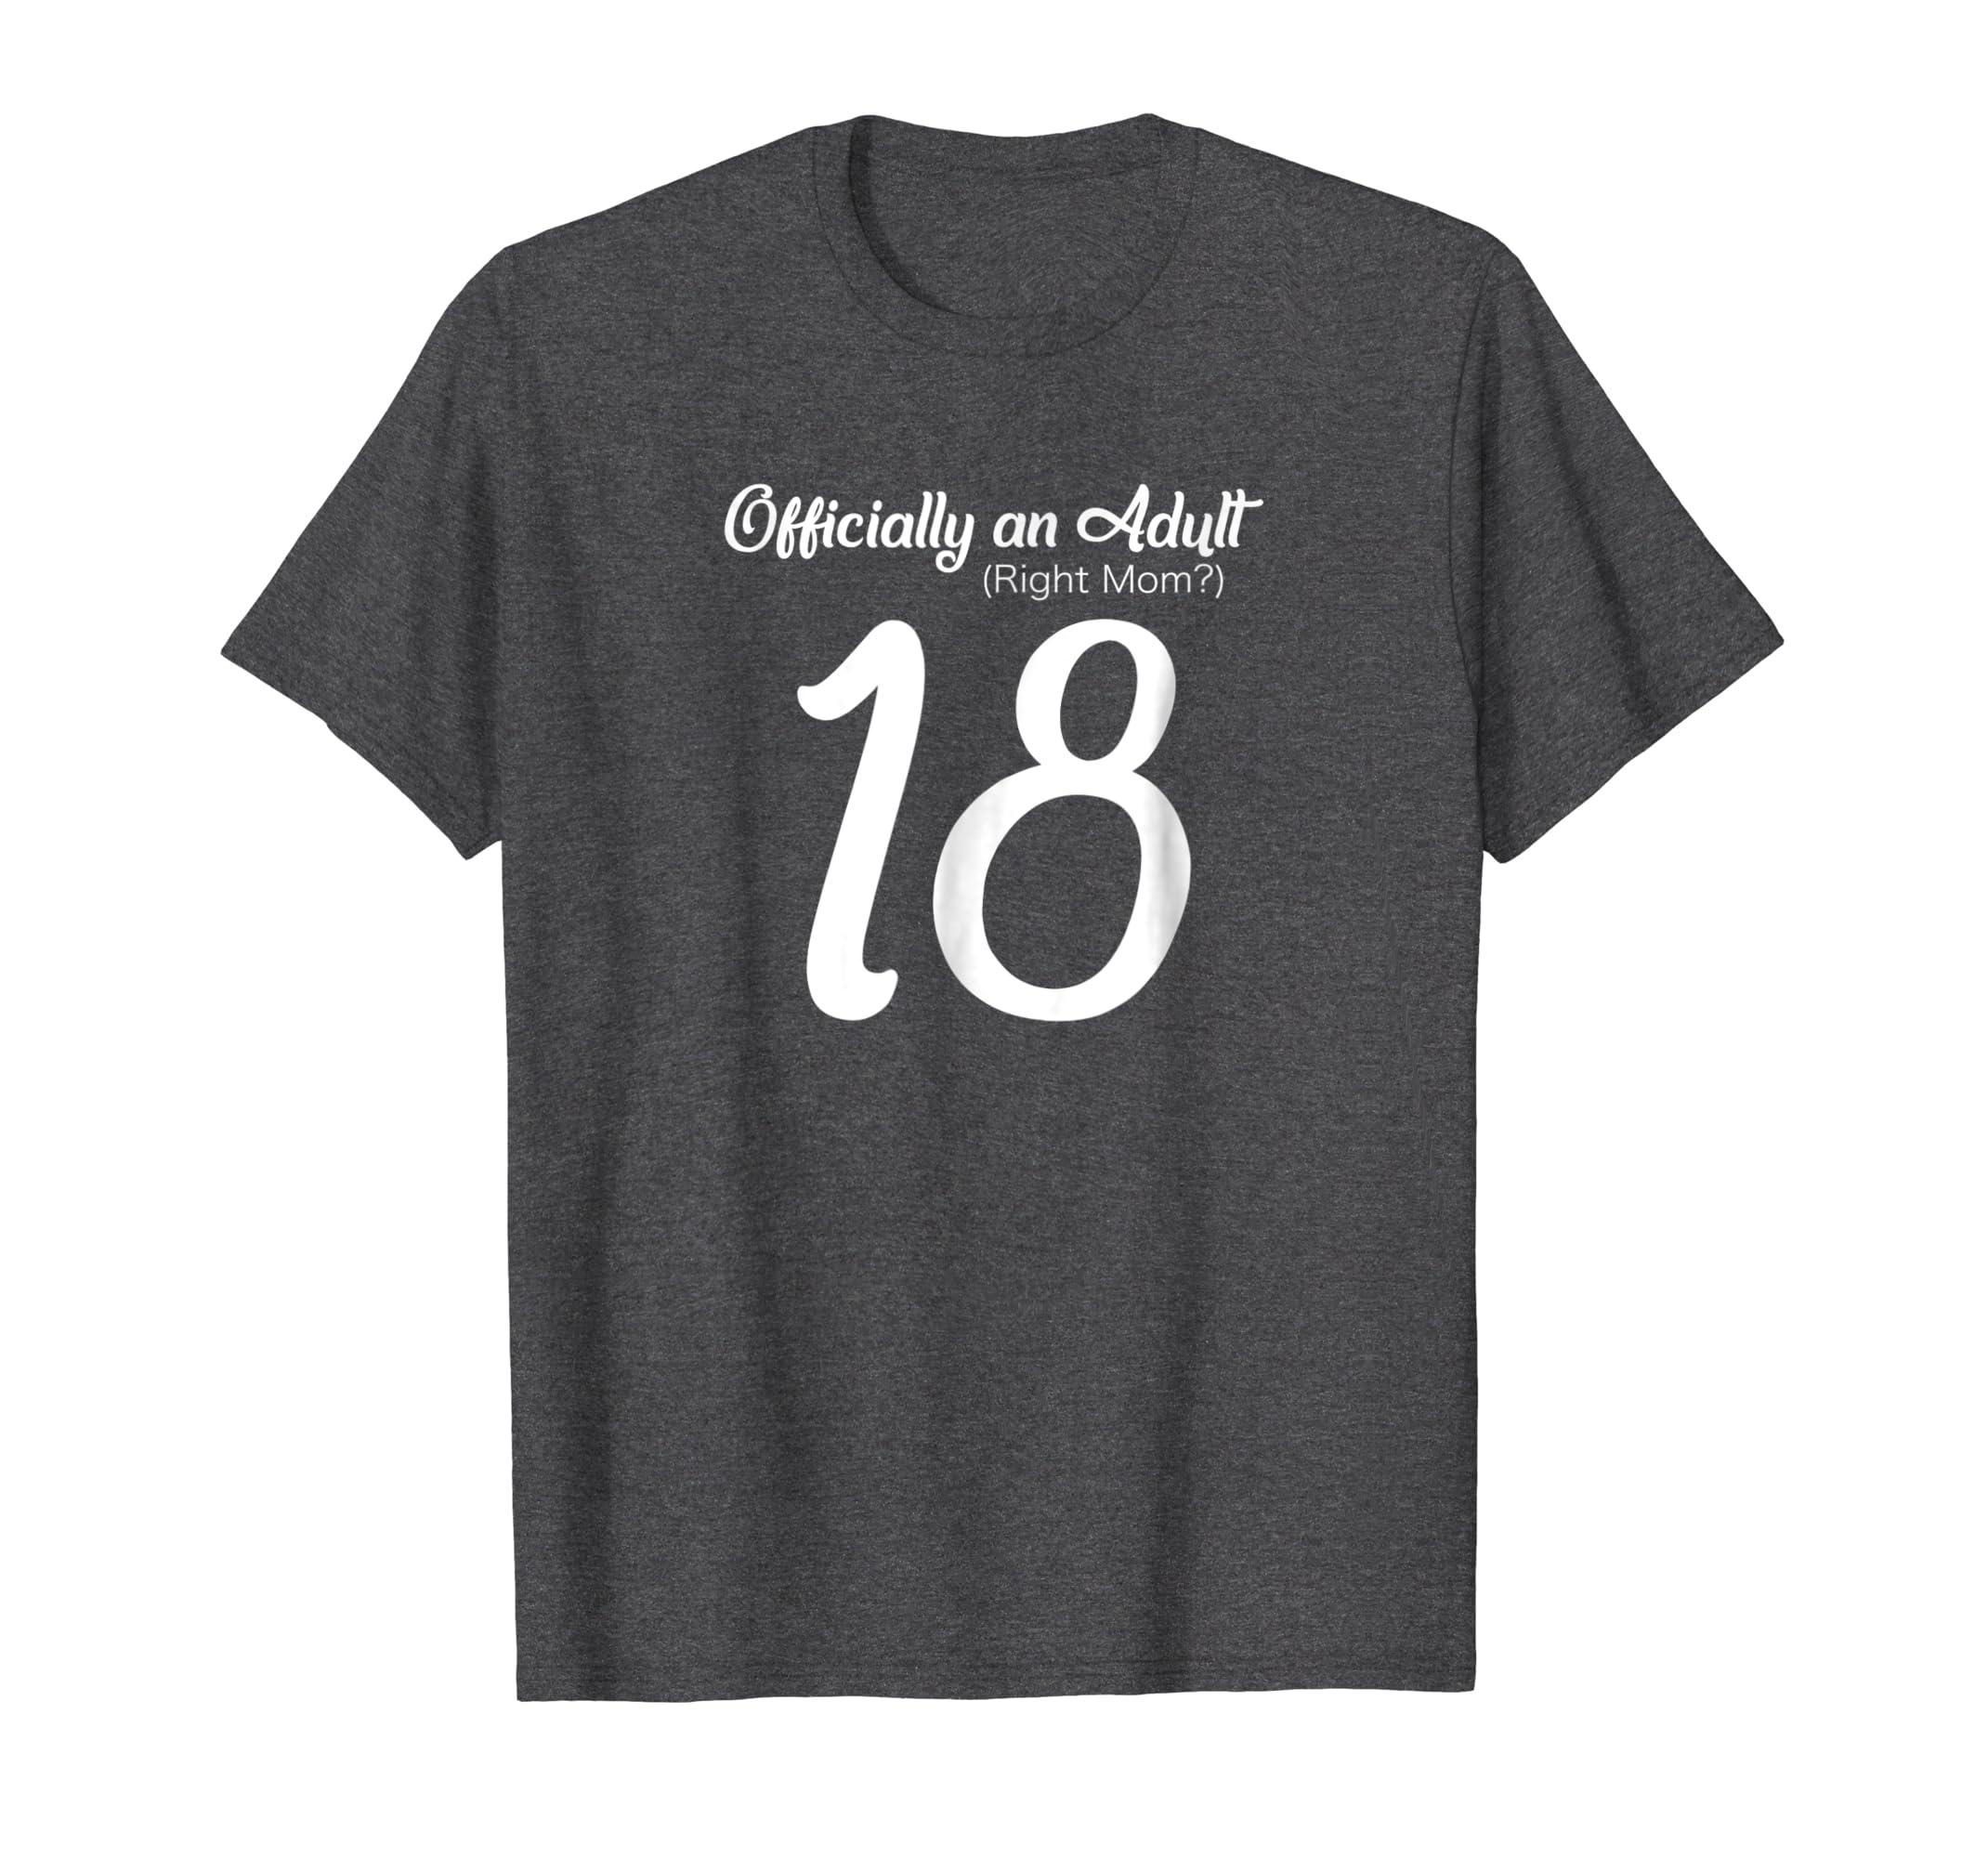 18th Birthday Gift Tshirt for Girls Women Official Adult Tee-Awarplus